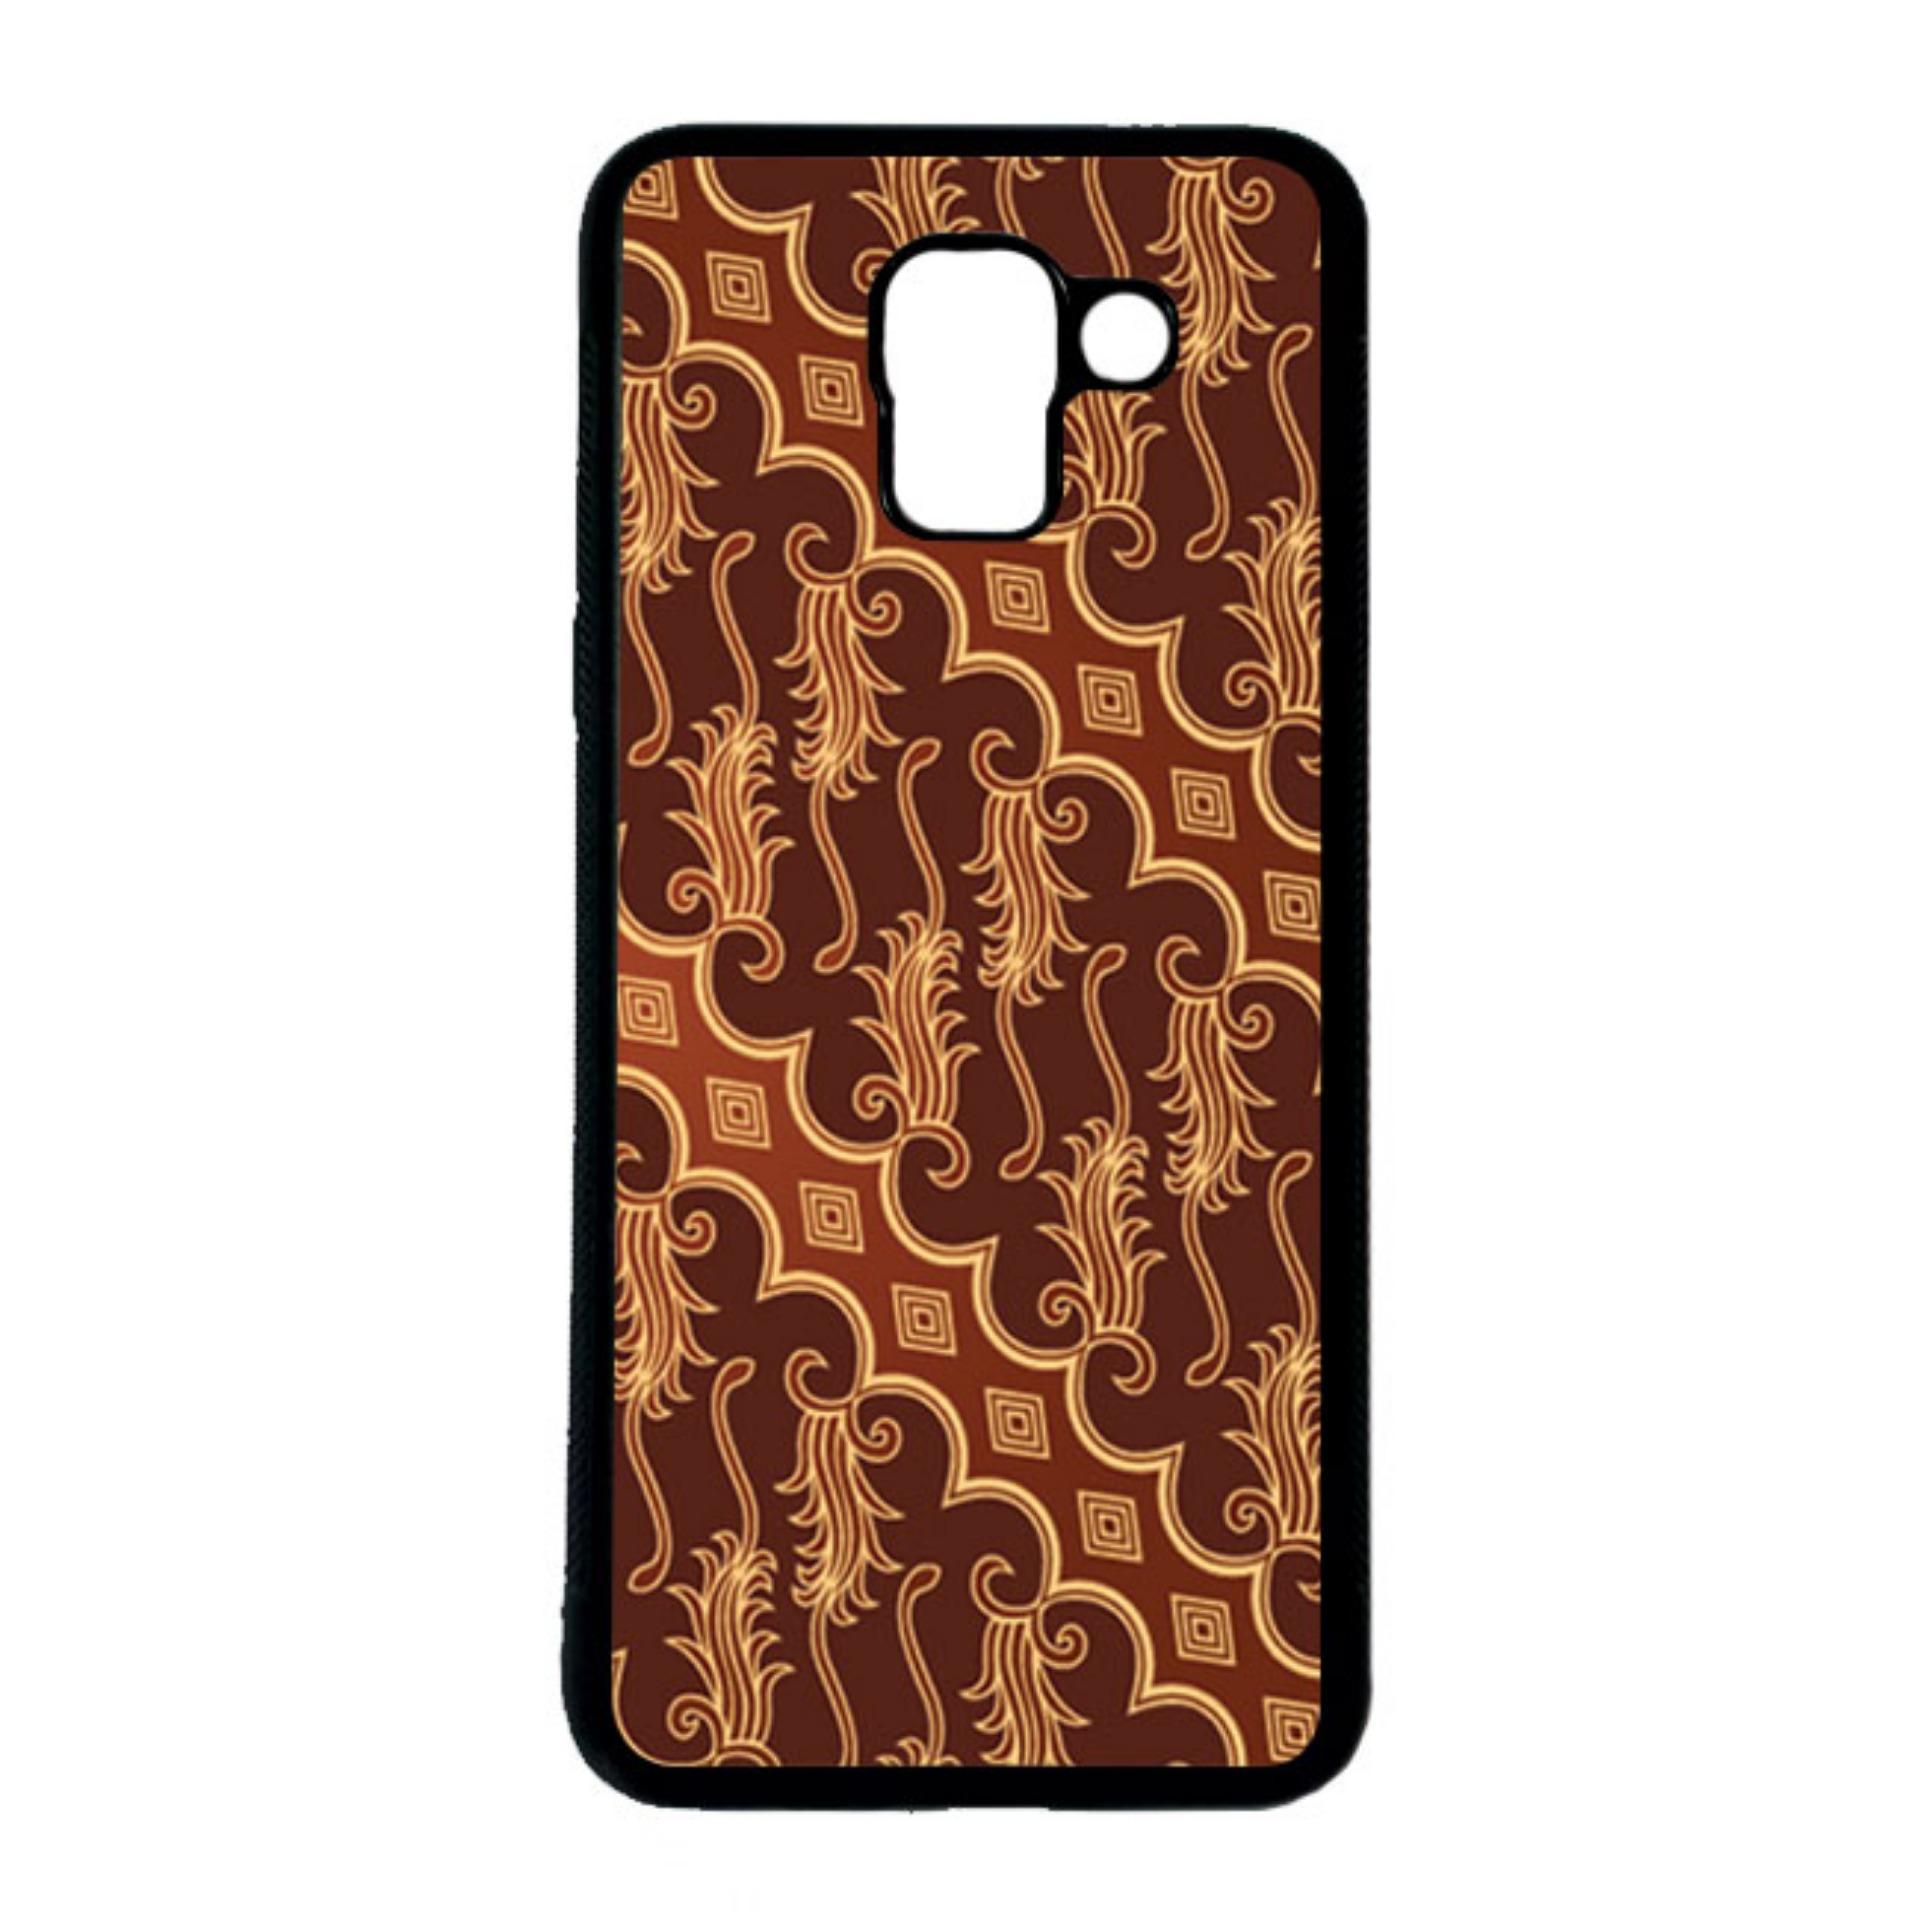 HEAVENCASE Casing Case Samsung Galaxy J6 Case Softcase Hitam Motif Batik Bunga 12